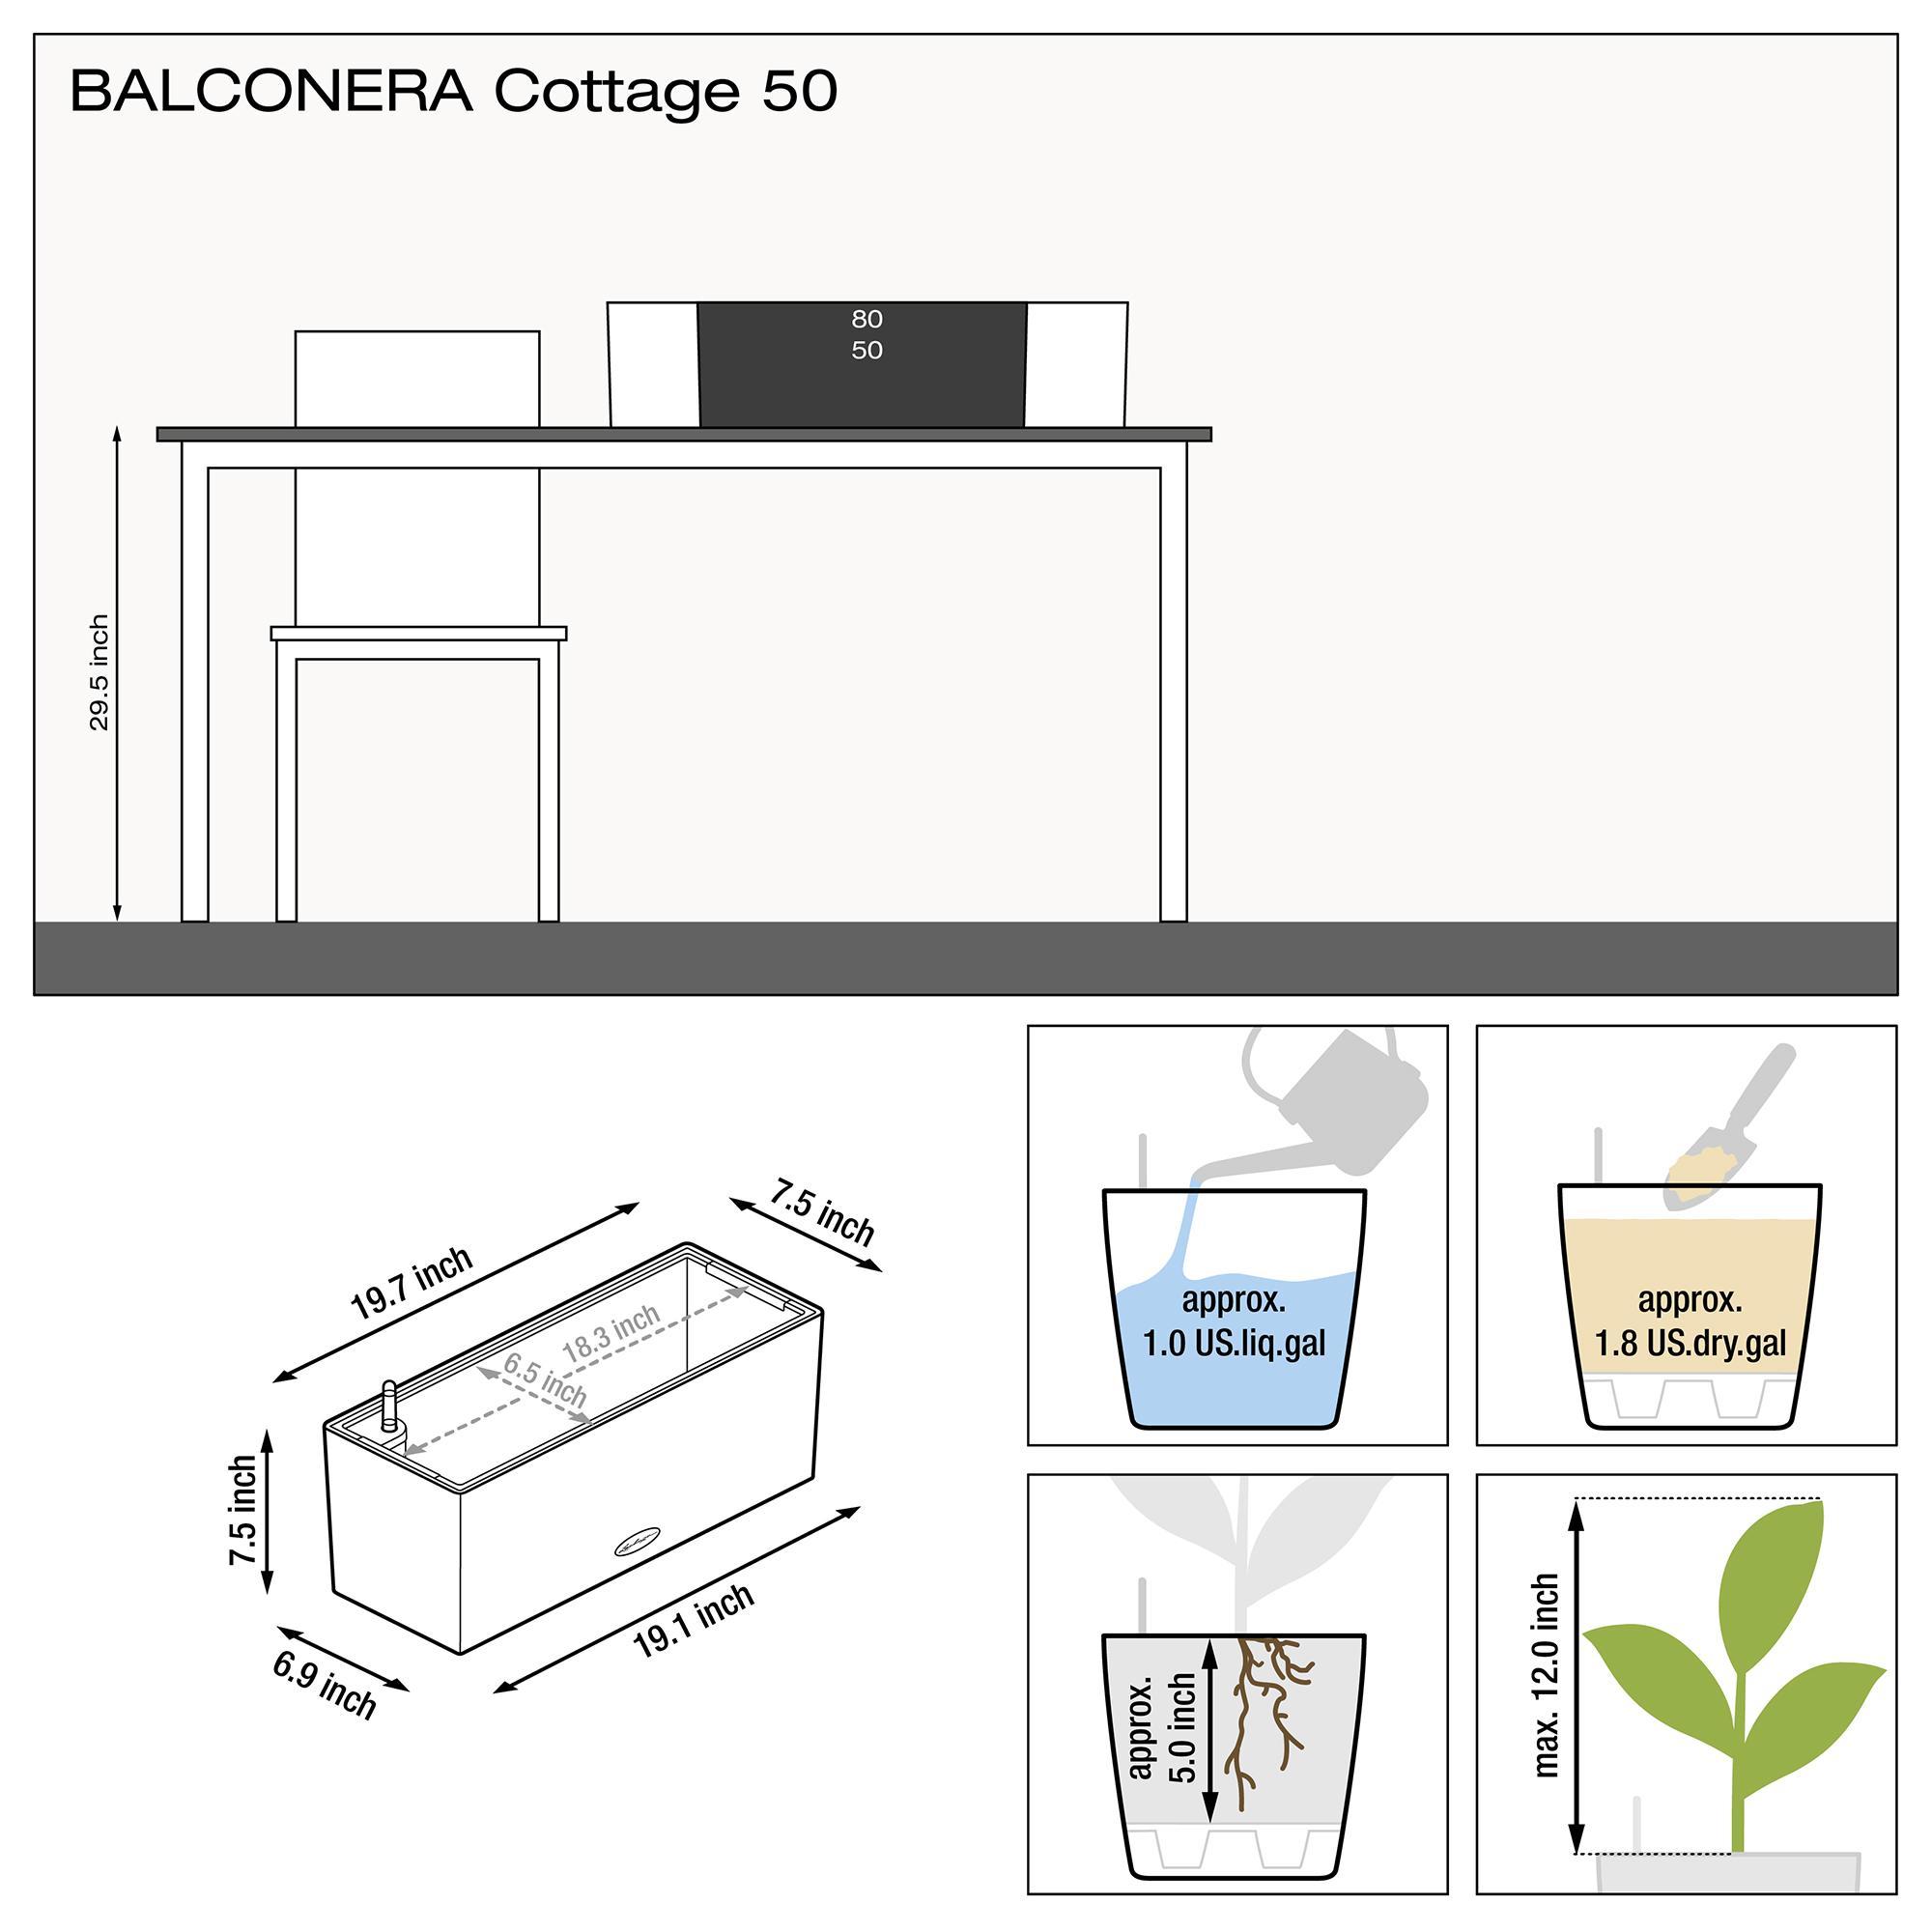 le_balconera-cottage50_product_addi_nz_us